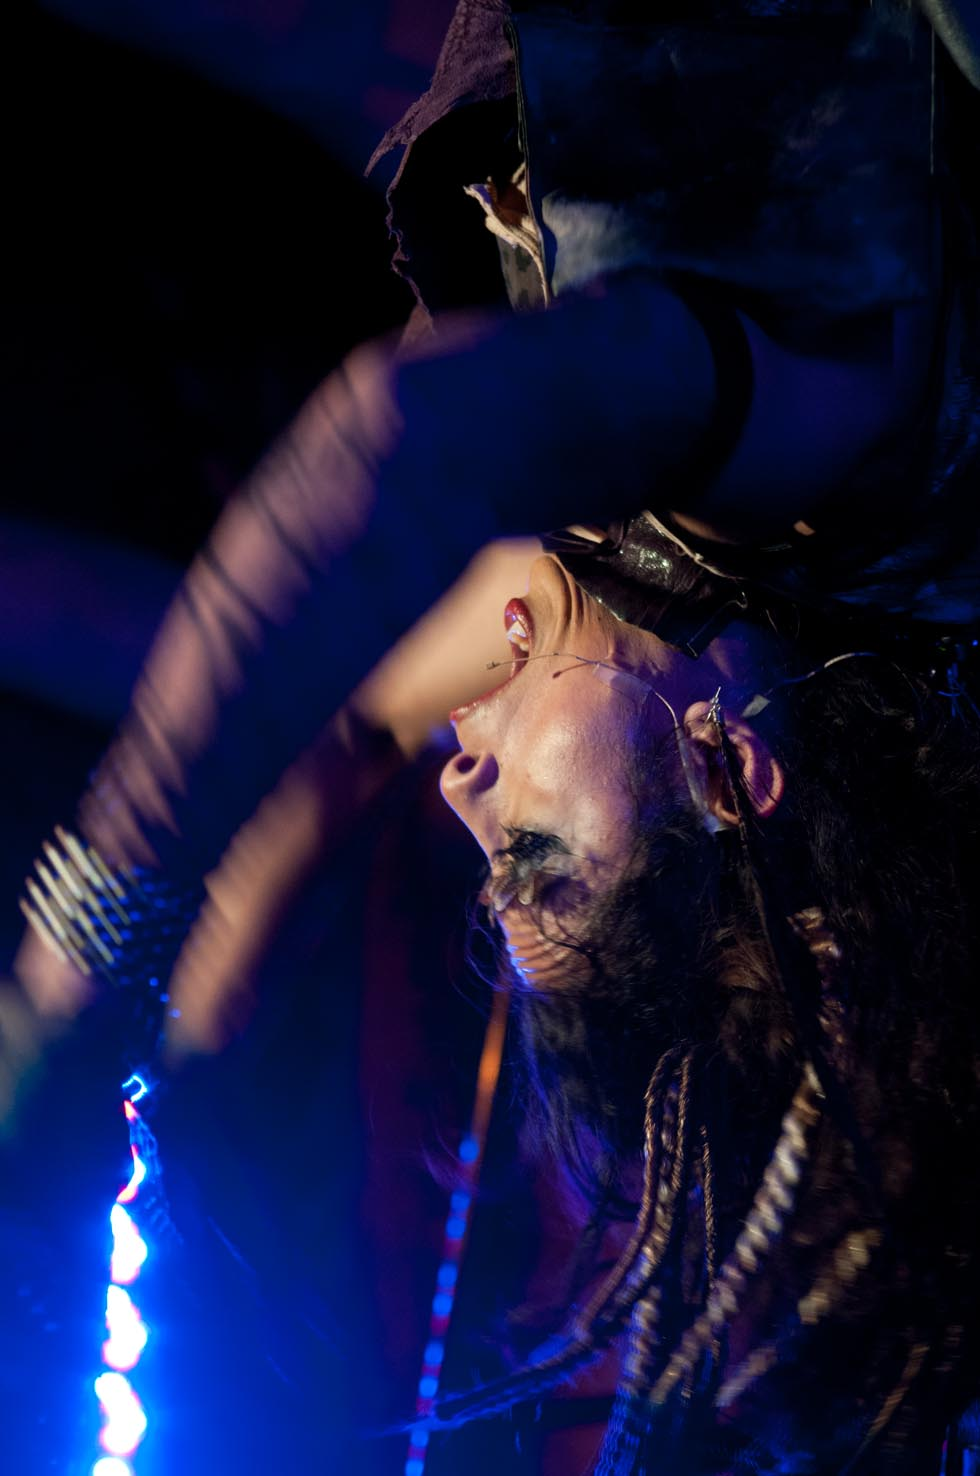 zum-schneider-nyc-2012-karneval-apocalyptika-4092.jpg